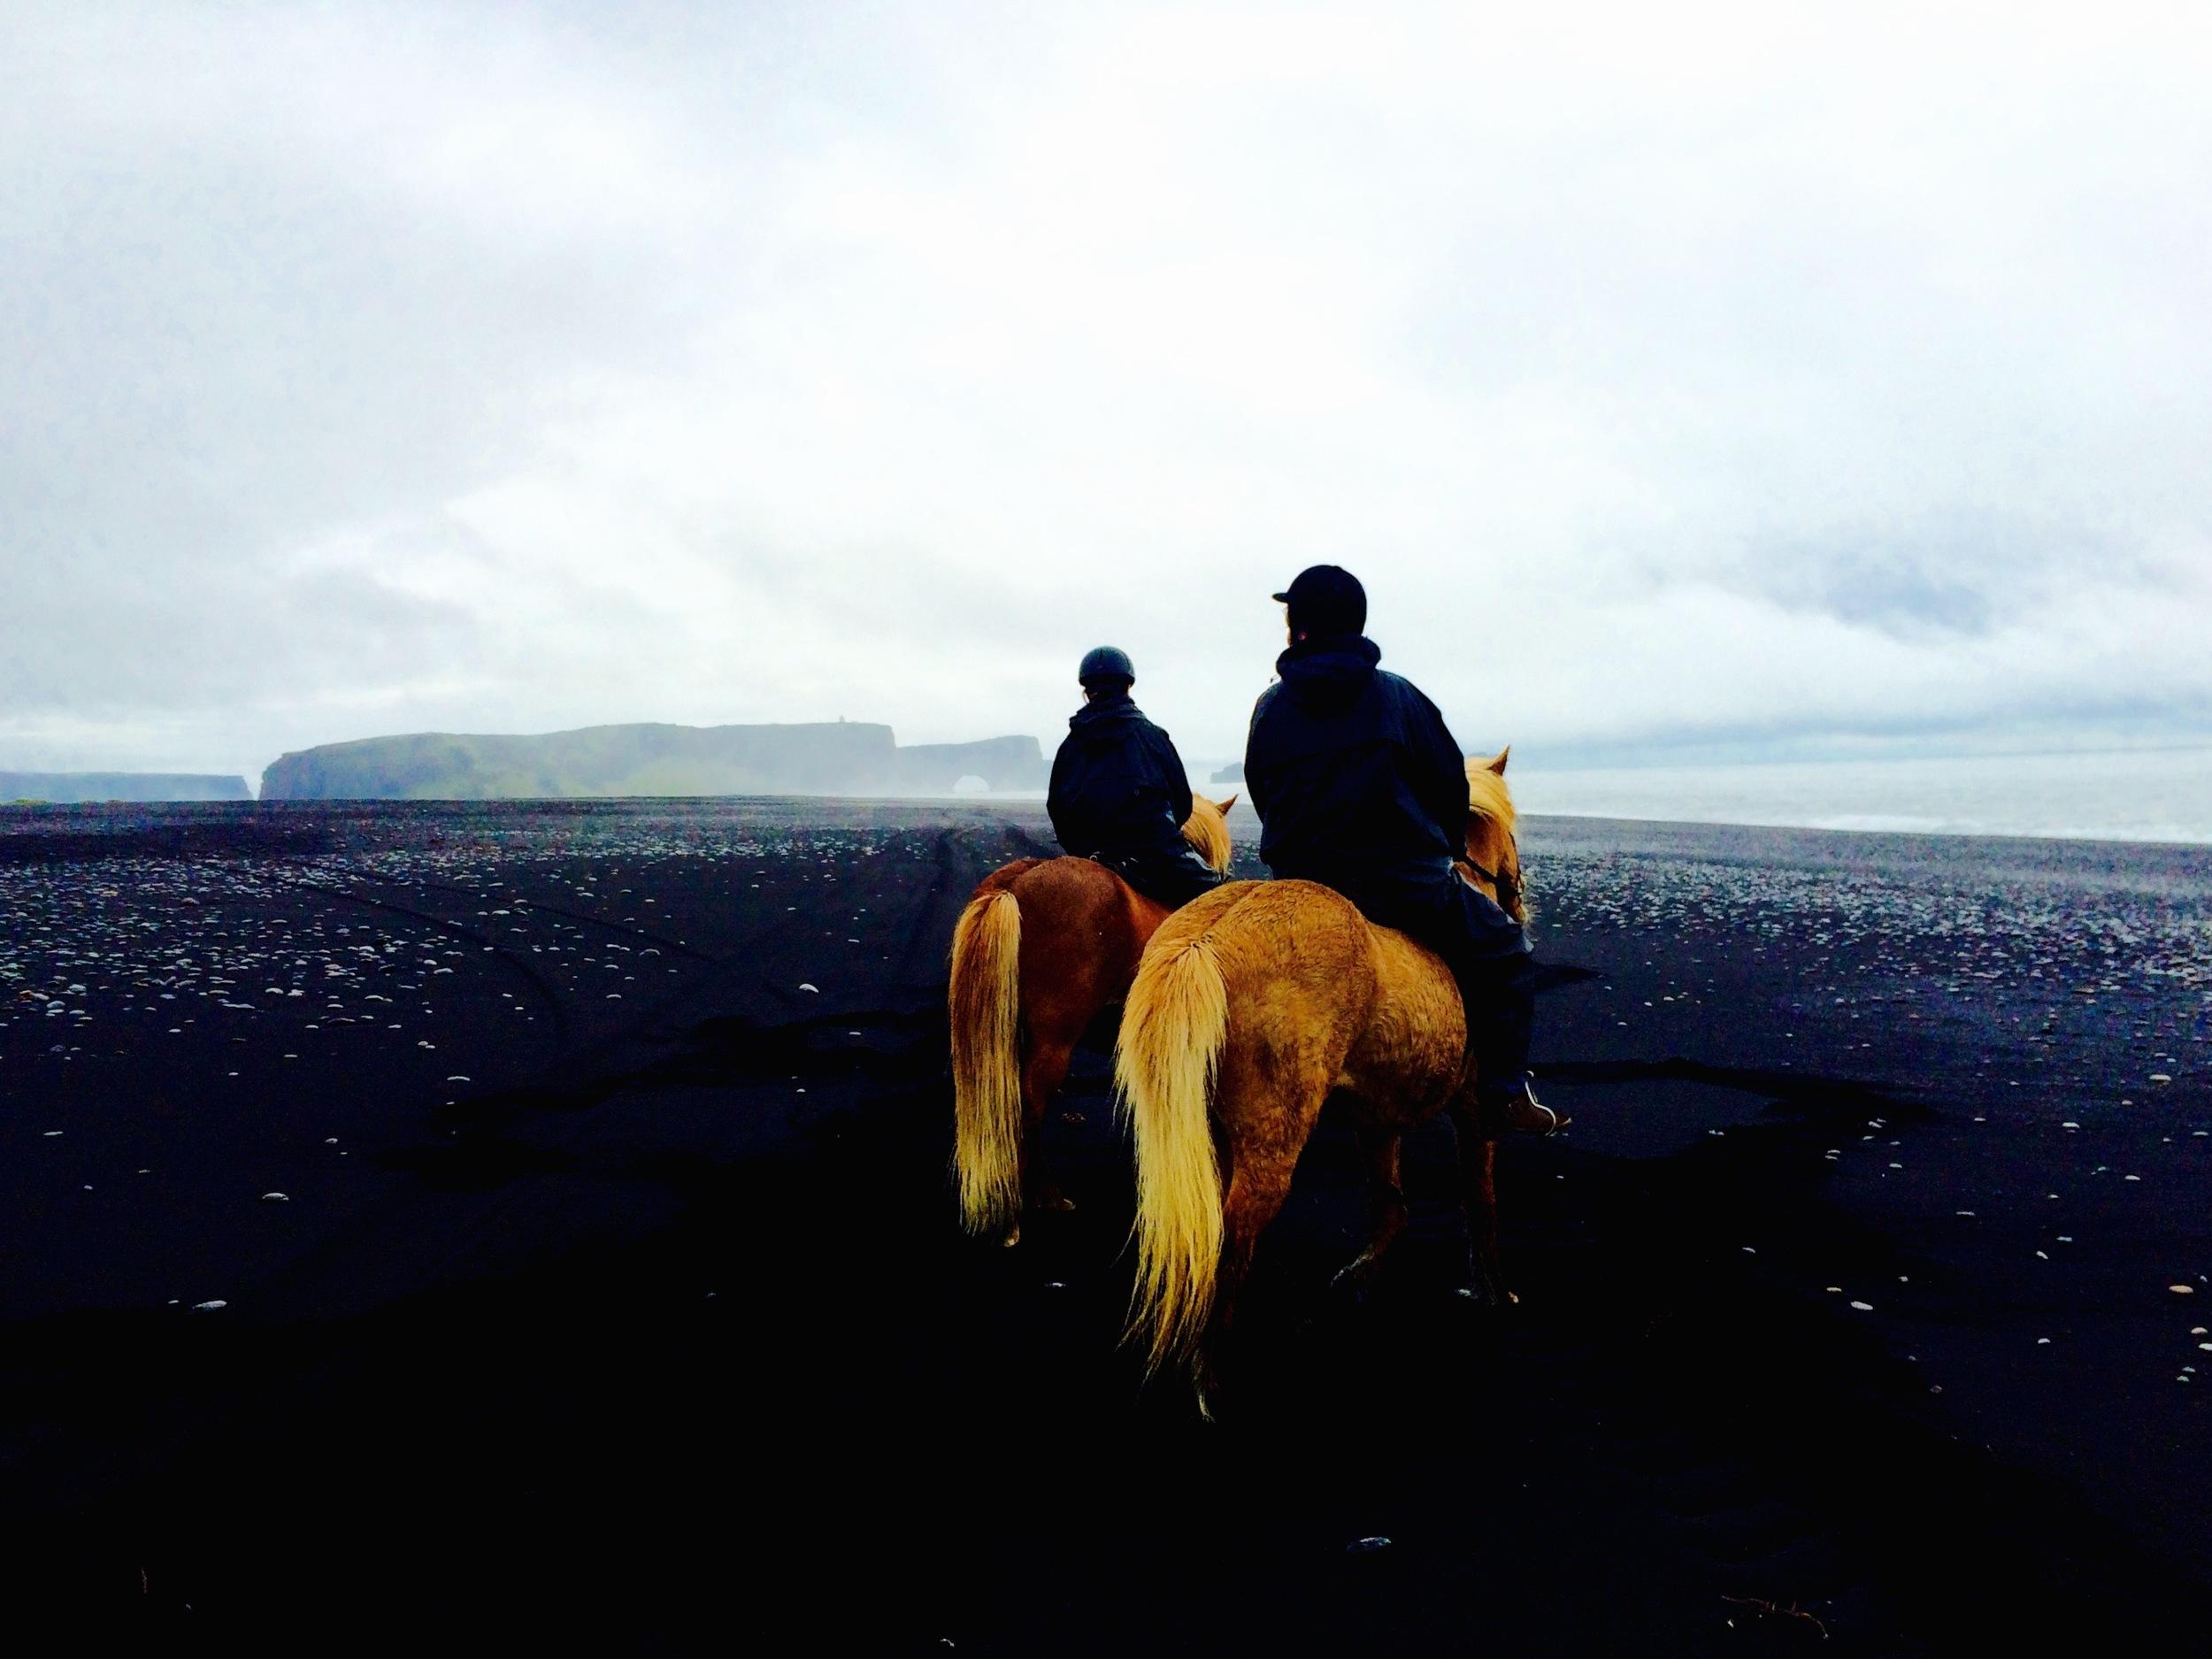 Riding on Reynisfjara black sand beach, Iceland - 3 Days*